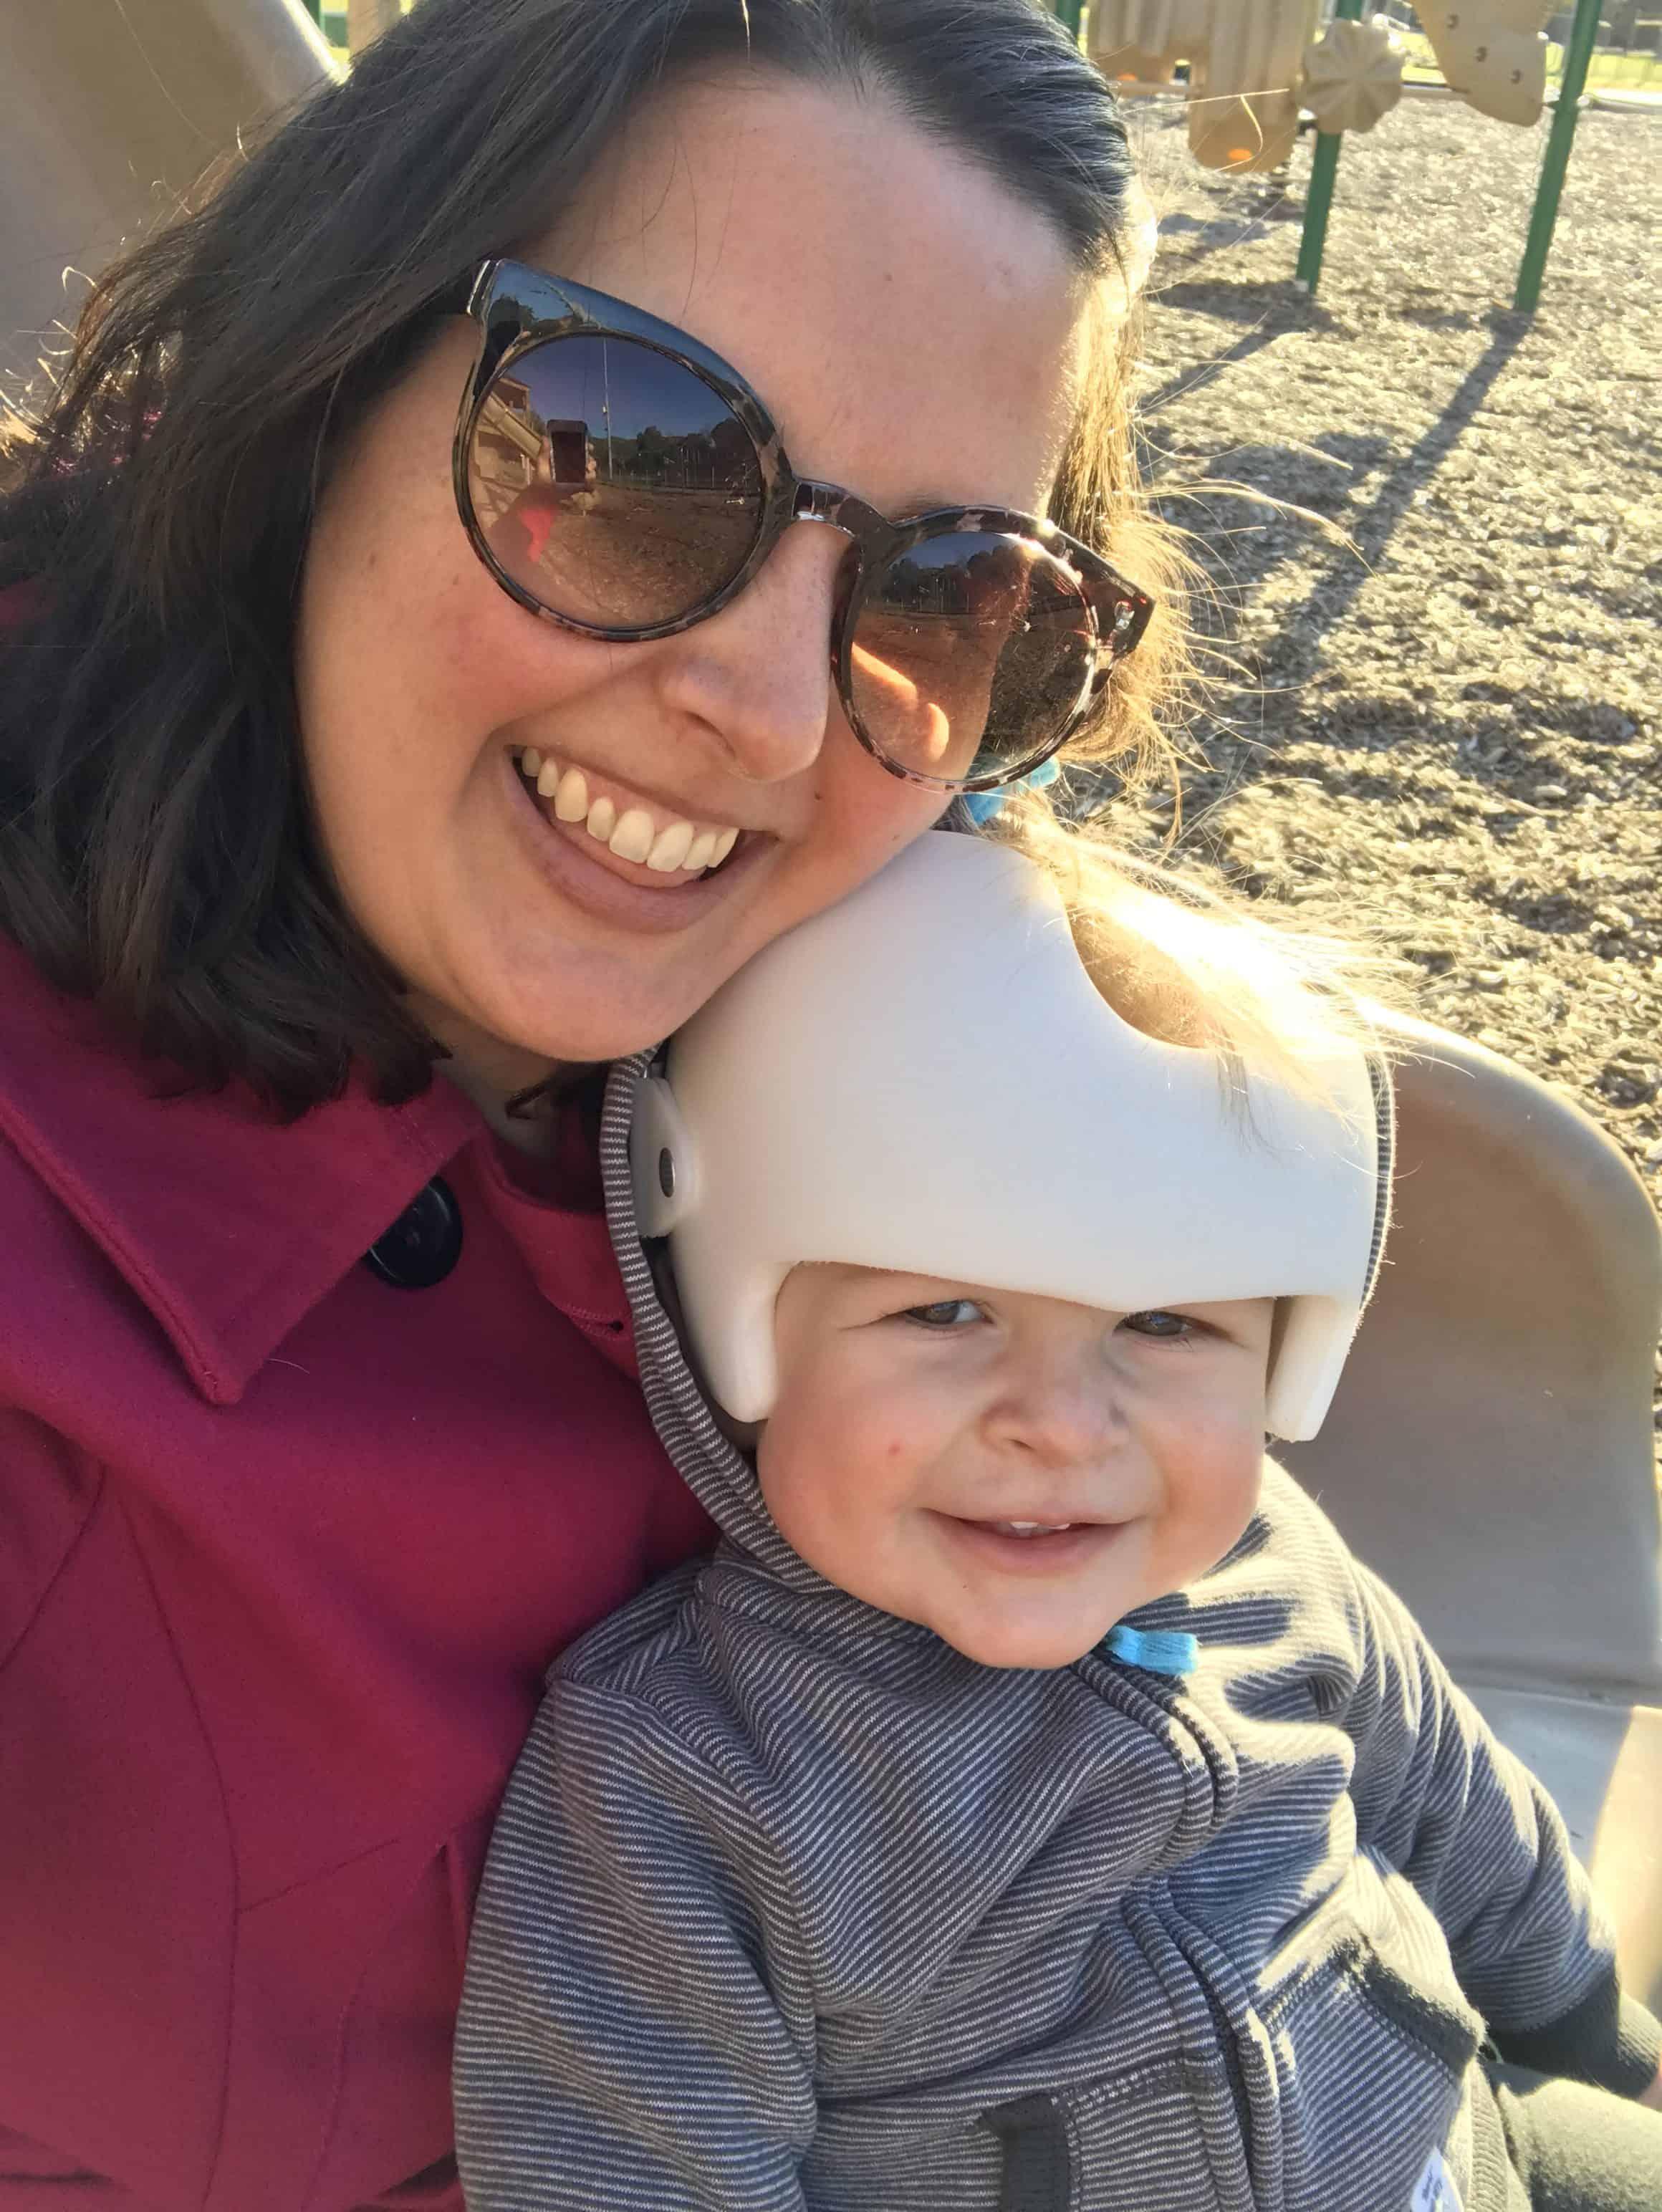 Why My Baby Wears a Cranial Helmet